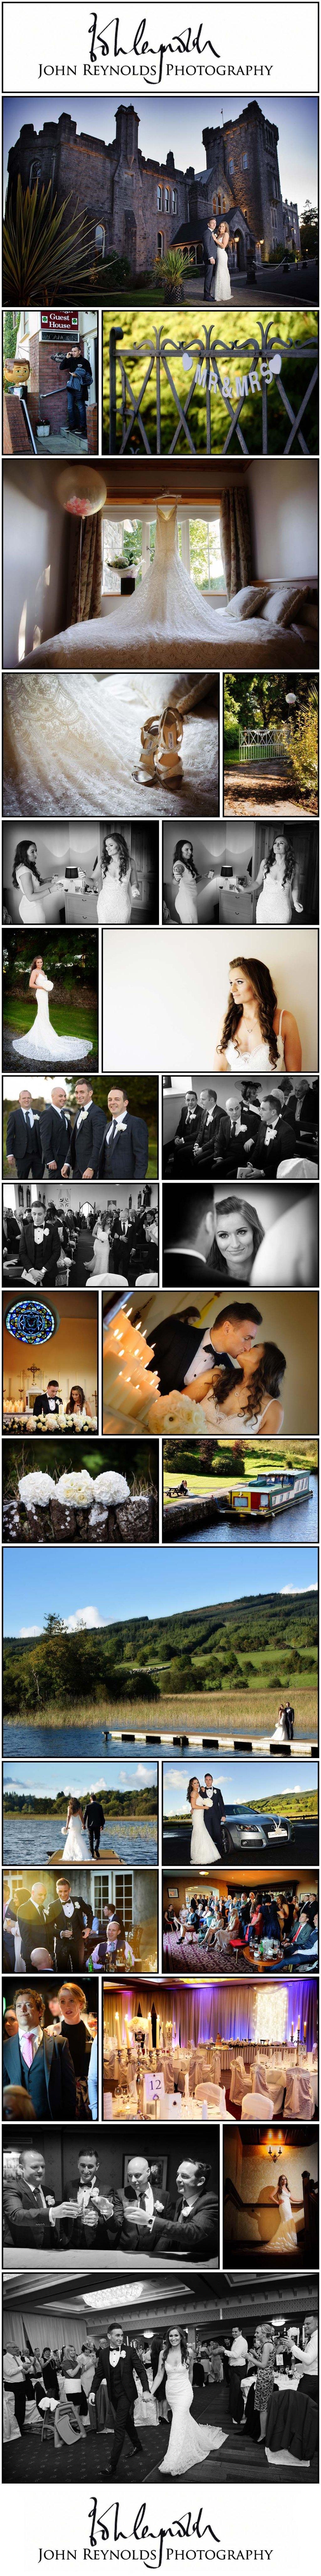 blog-collage-camille-shane2